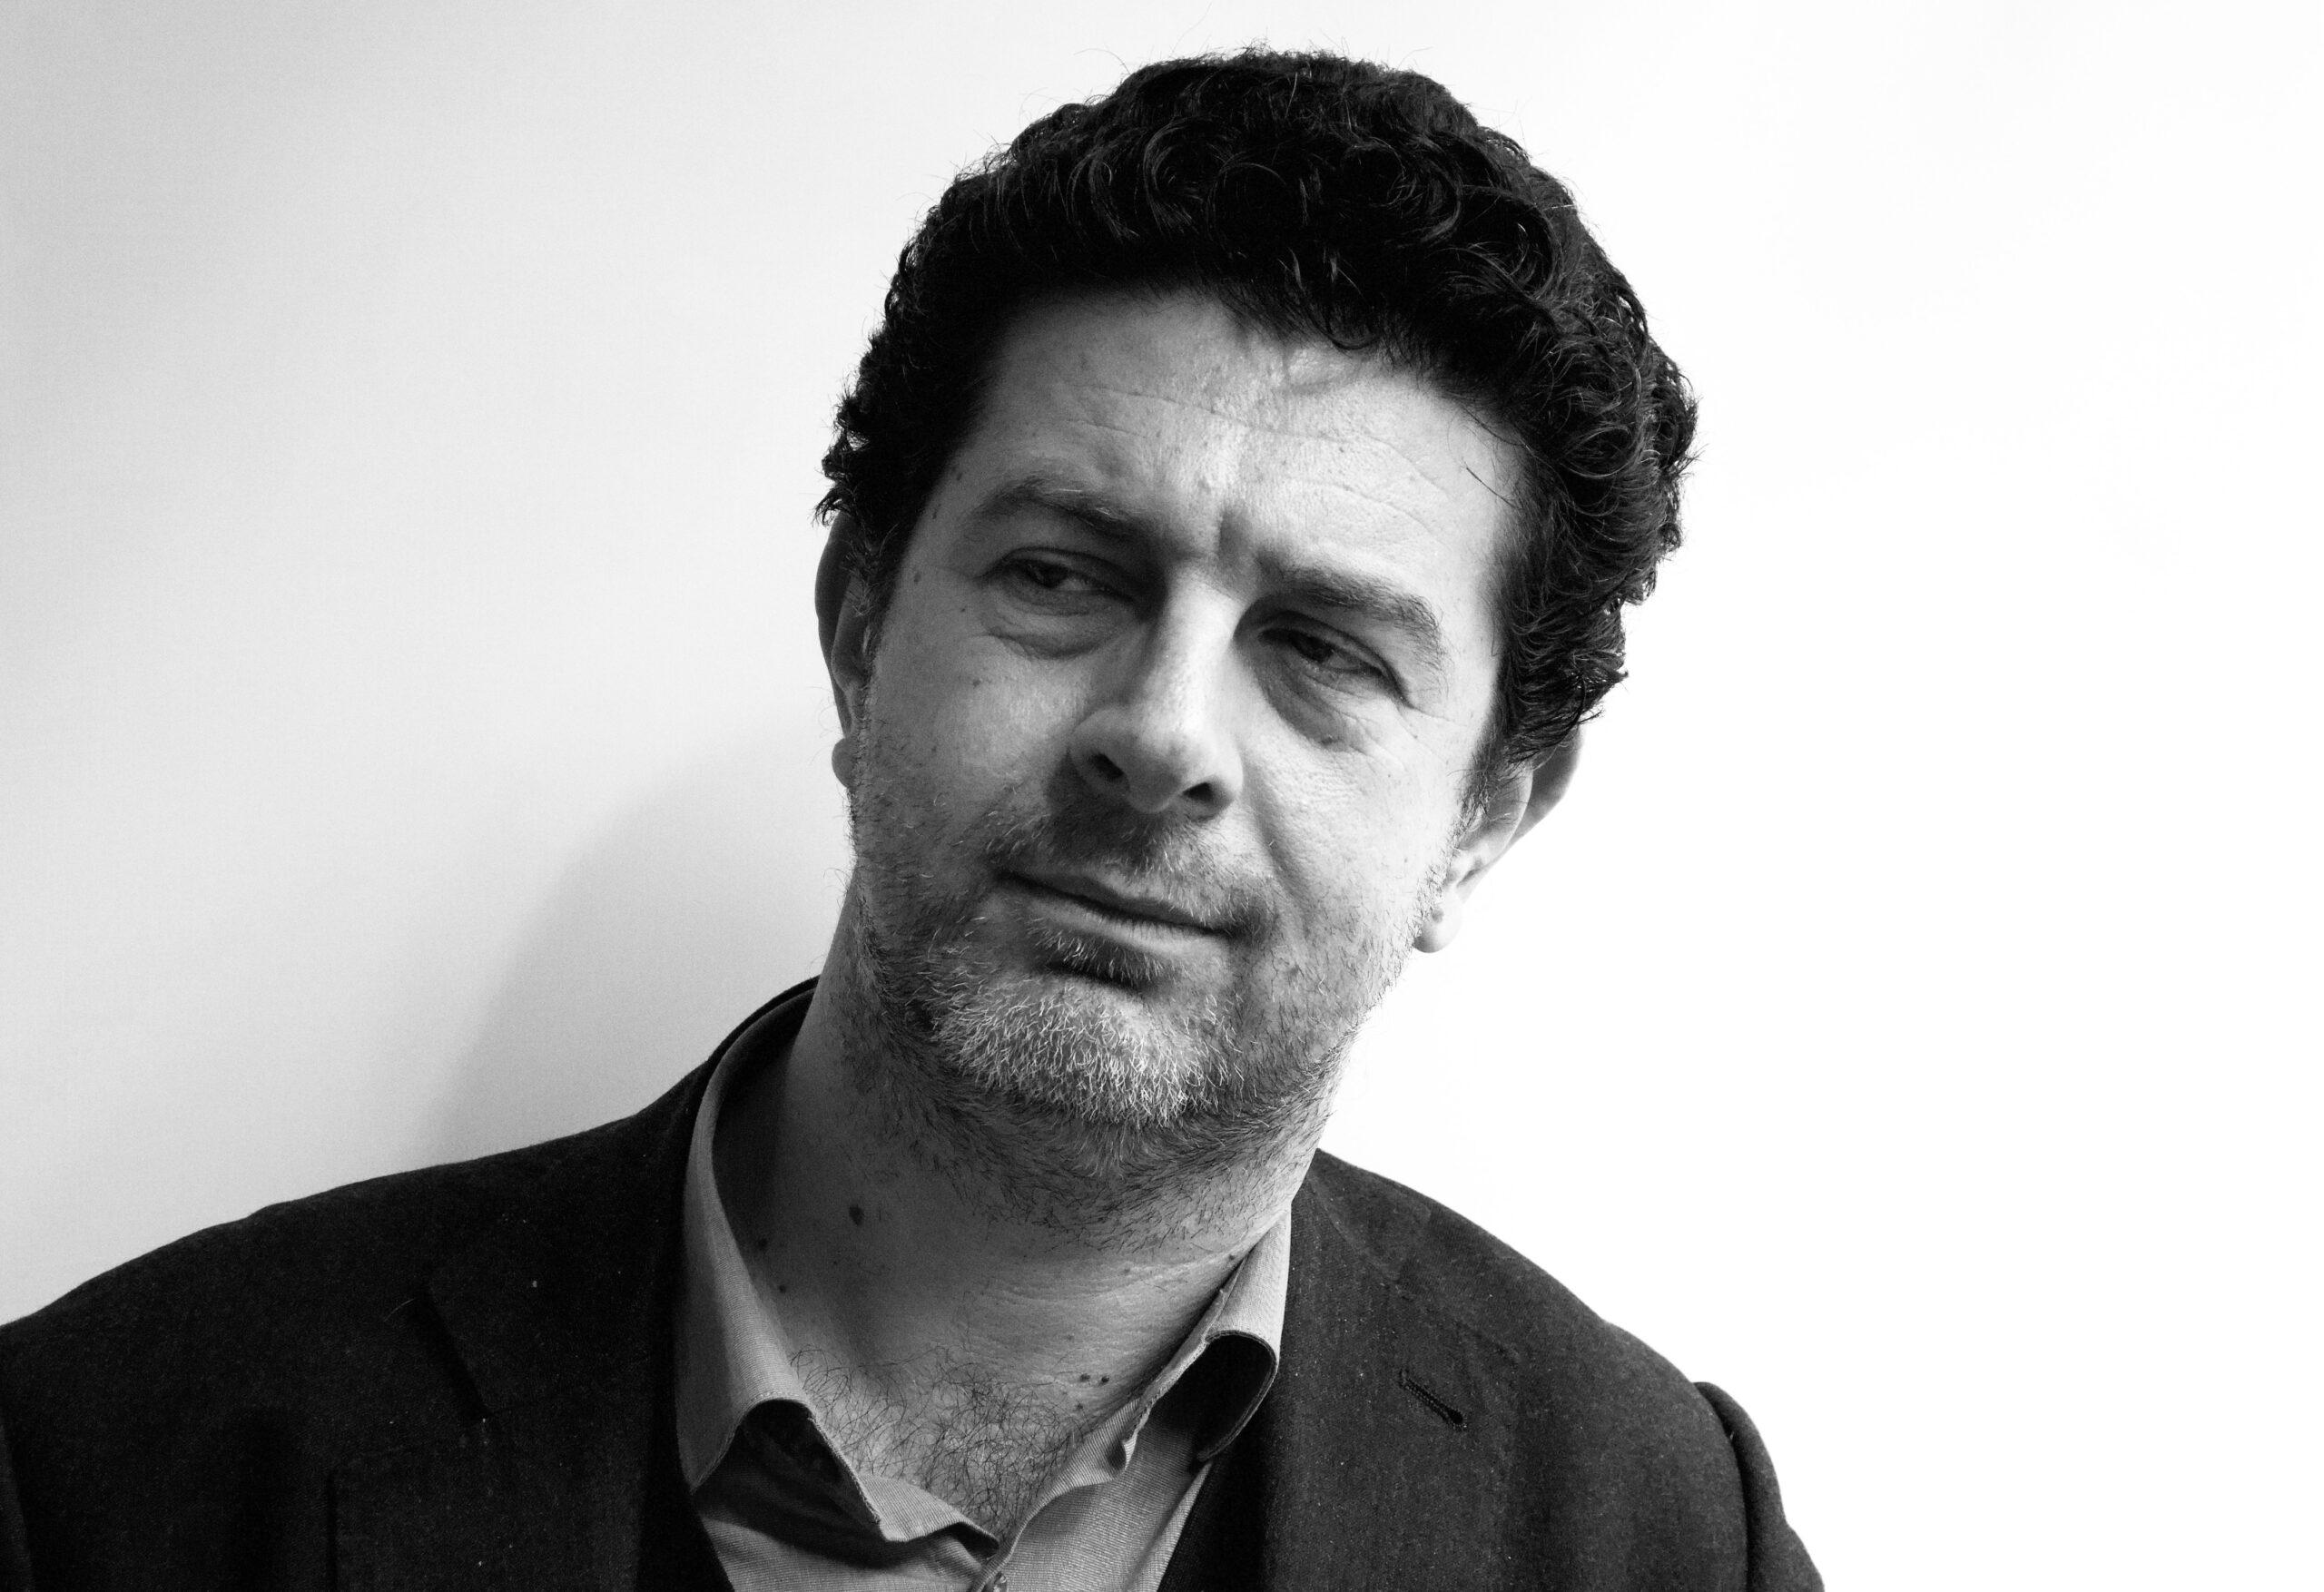 Enzo Agliardi